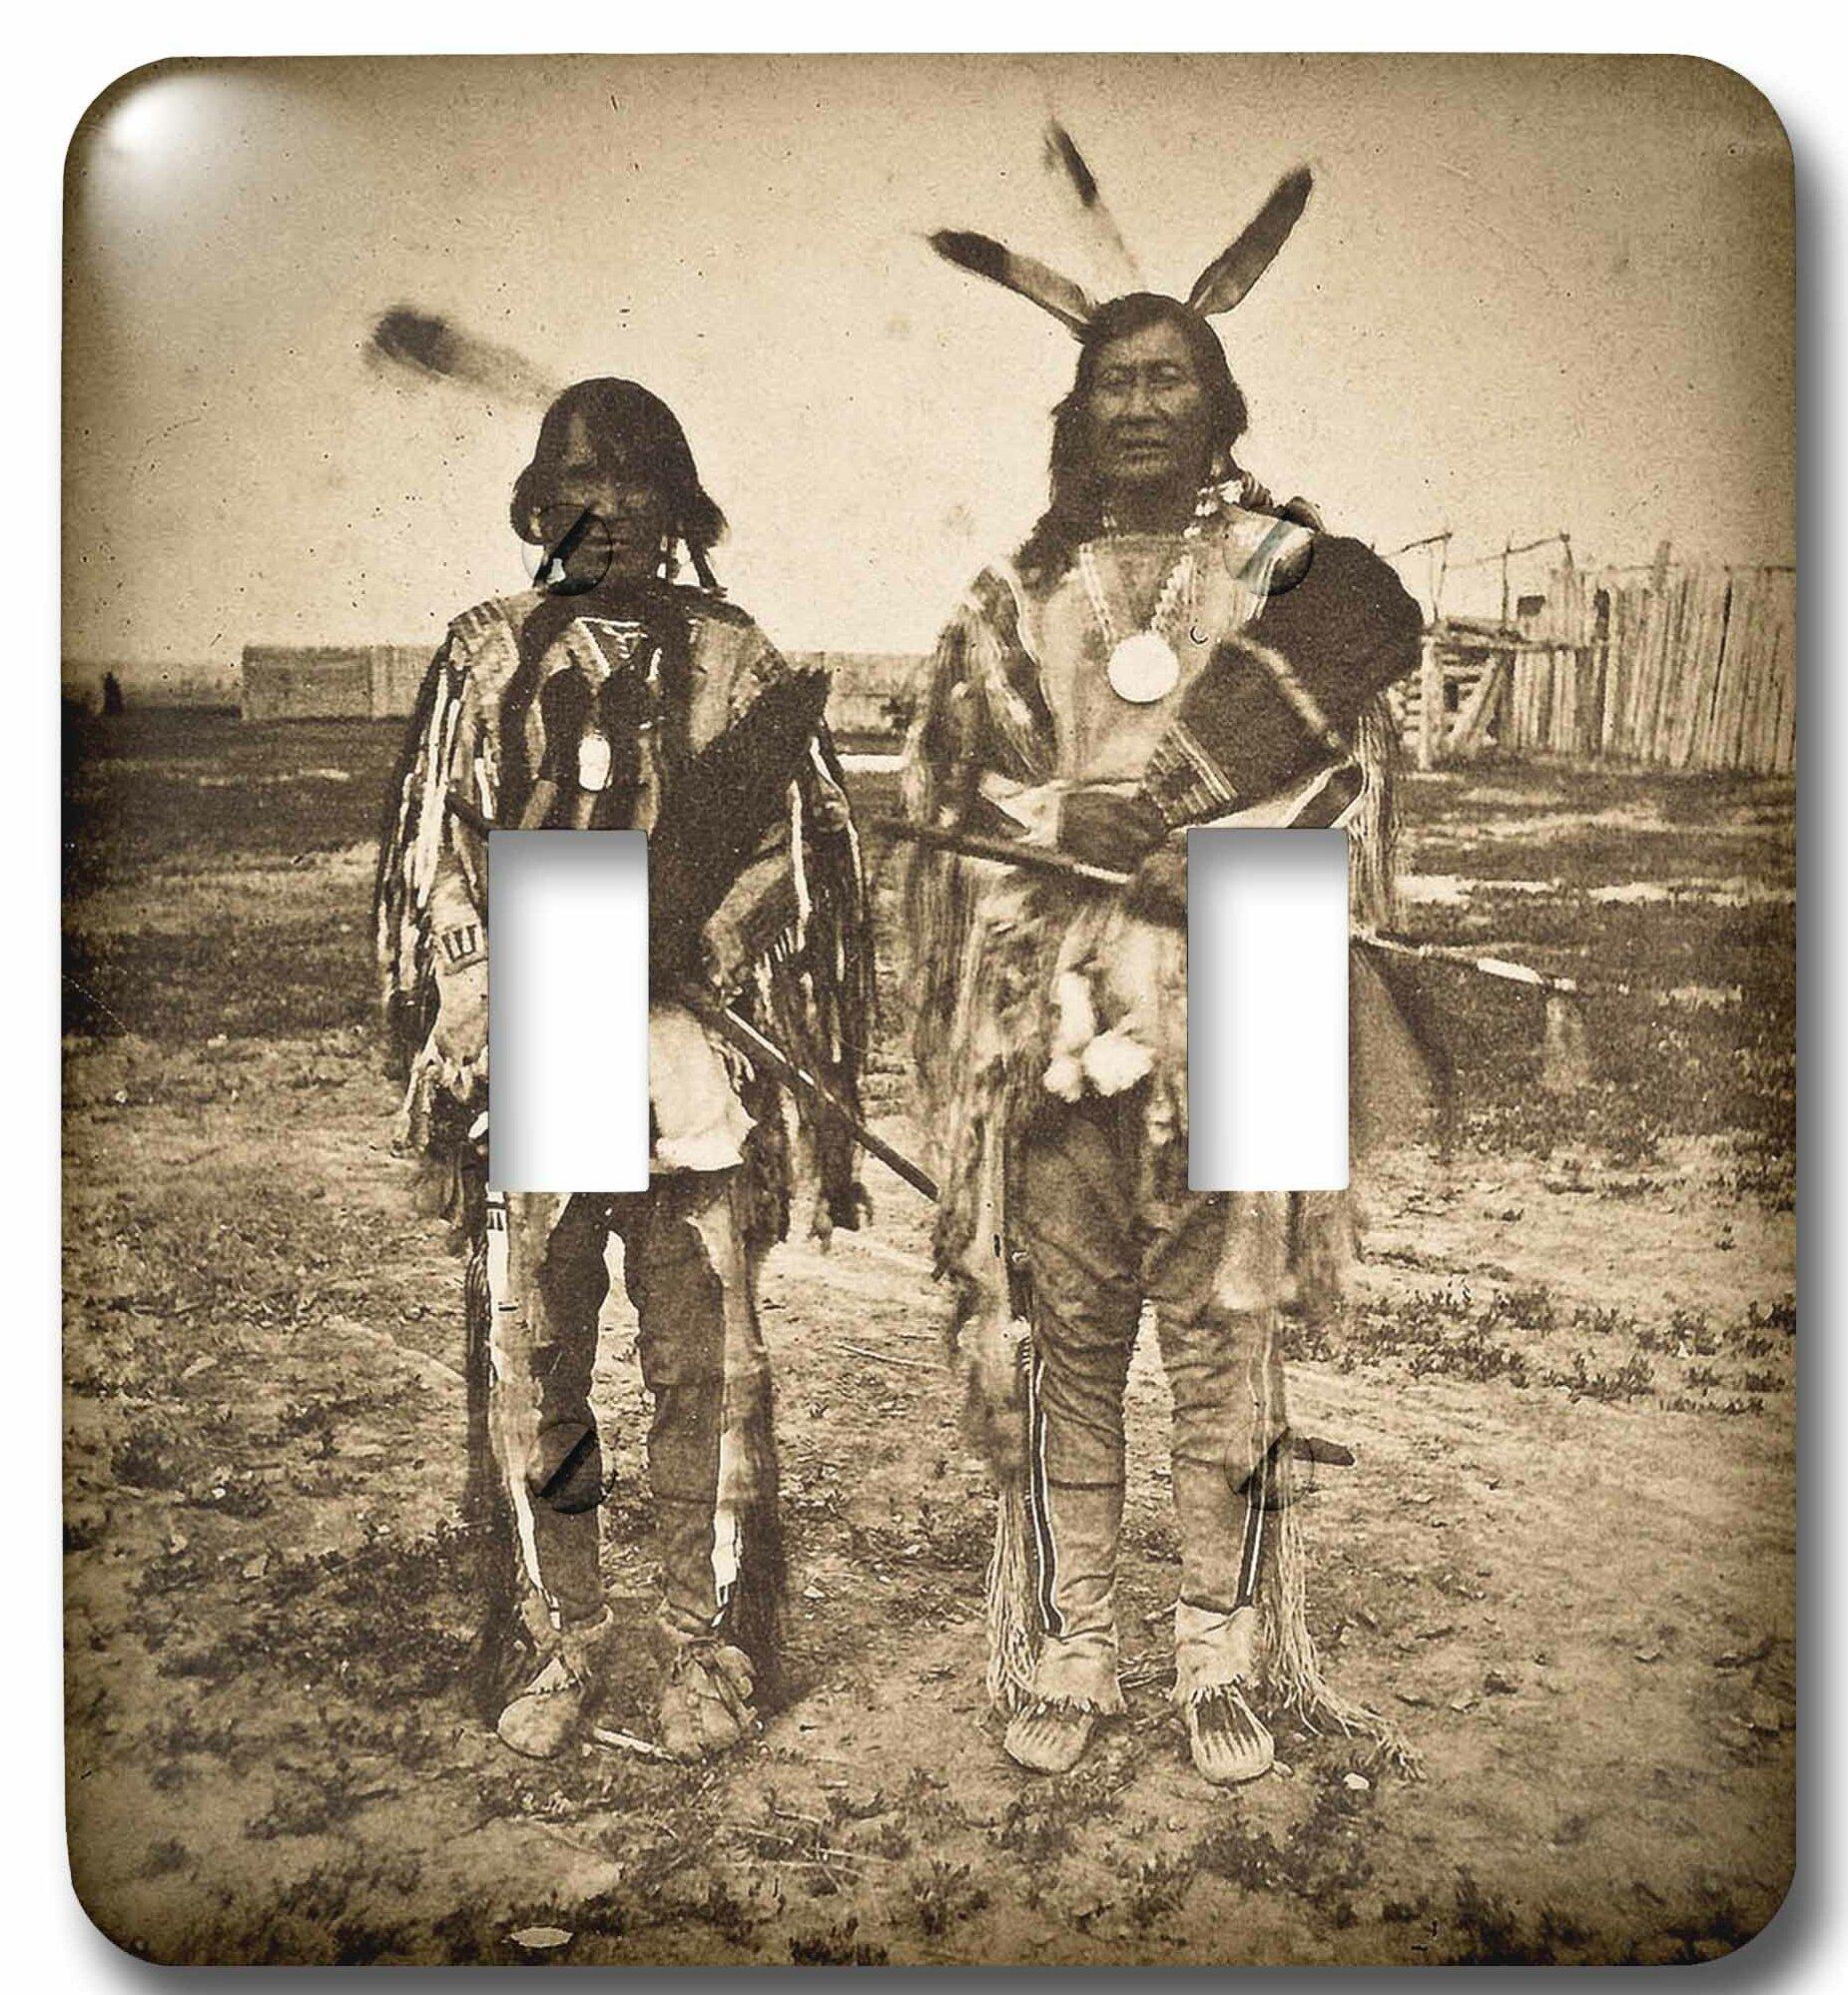 3drose Arikara Chiefs With Peace Pipes At Fort Berthold Dakota Territory 2 Gang Toggle Light Switch Wall Plate Wayfair